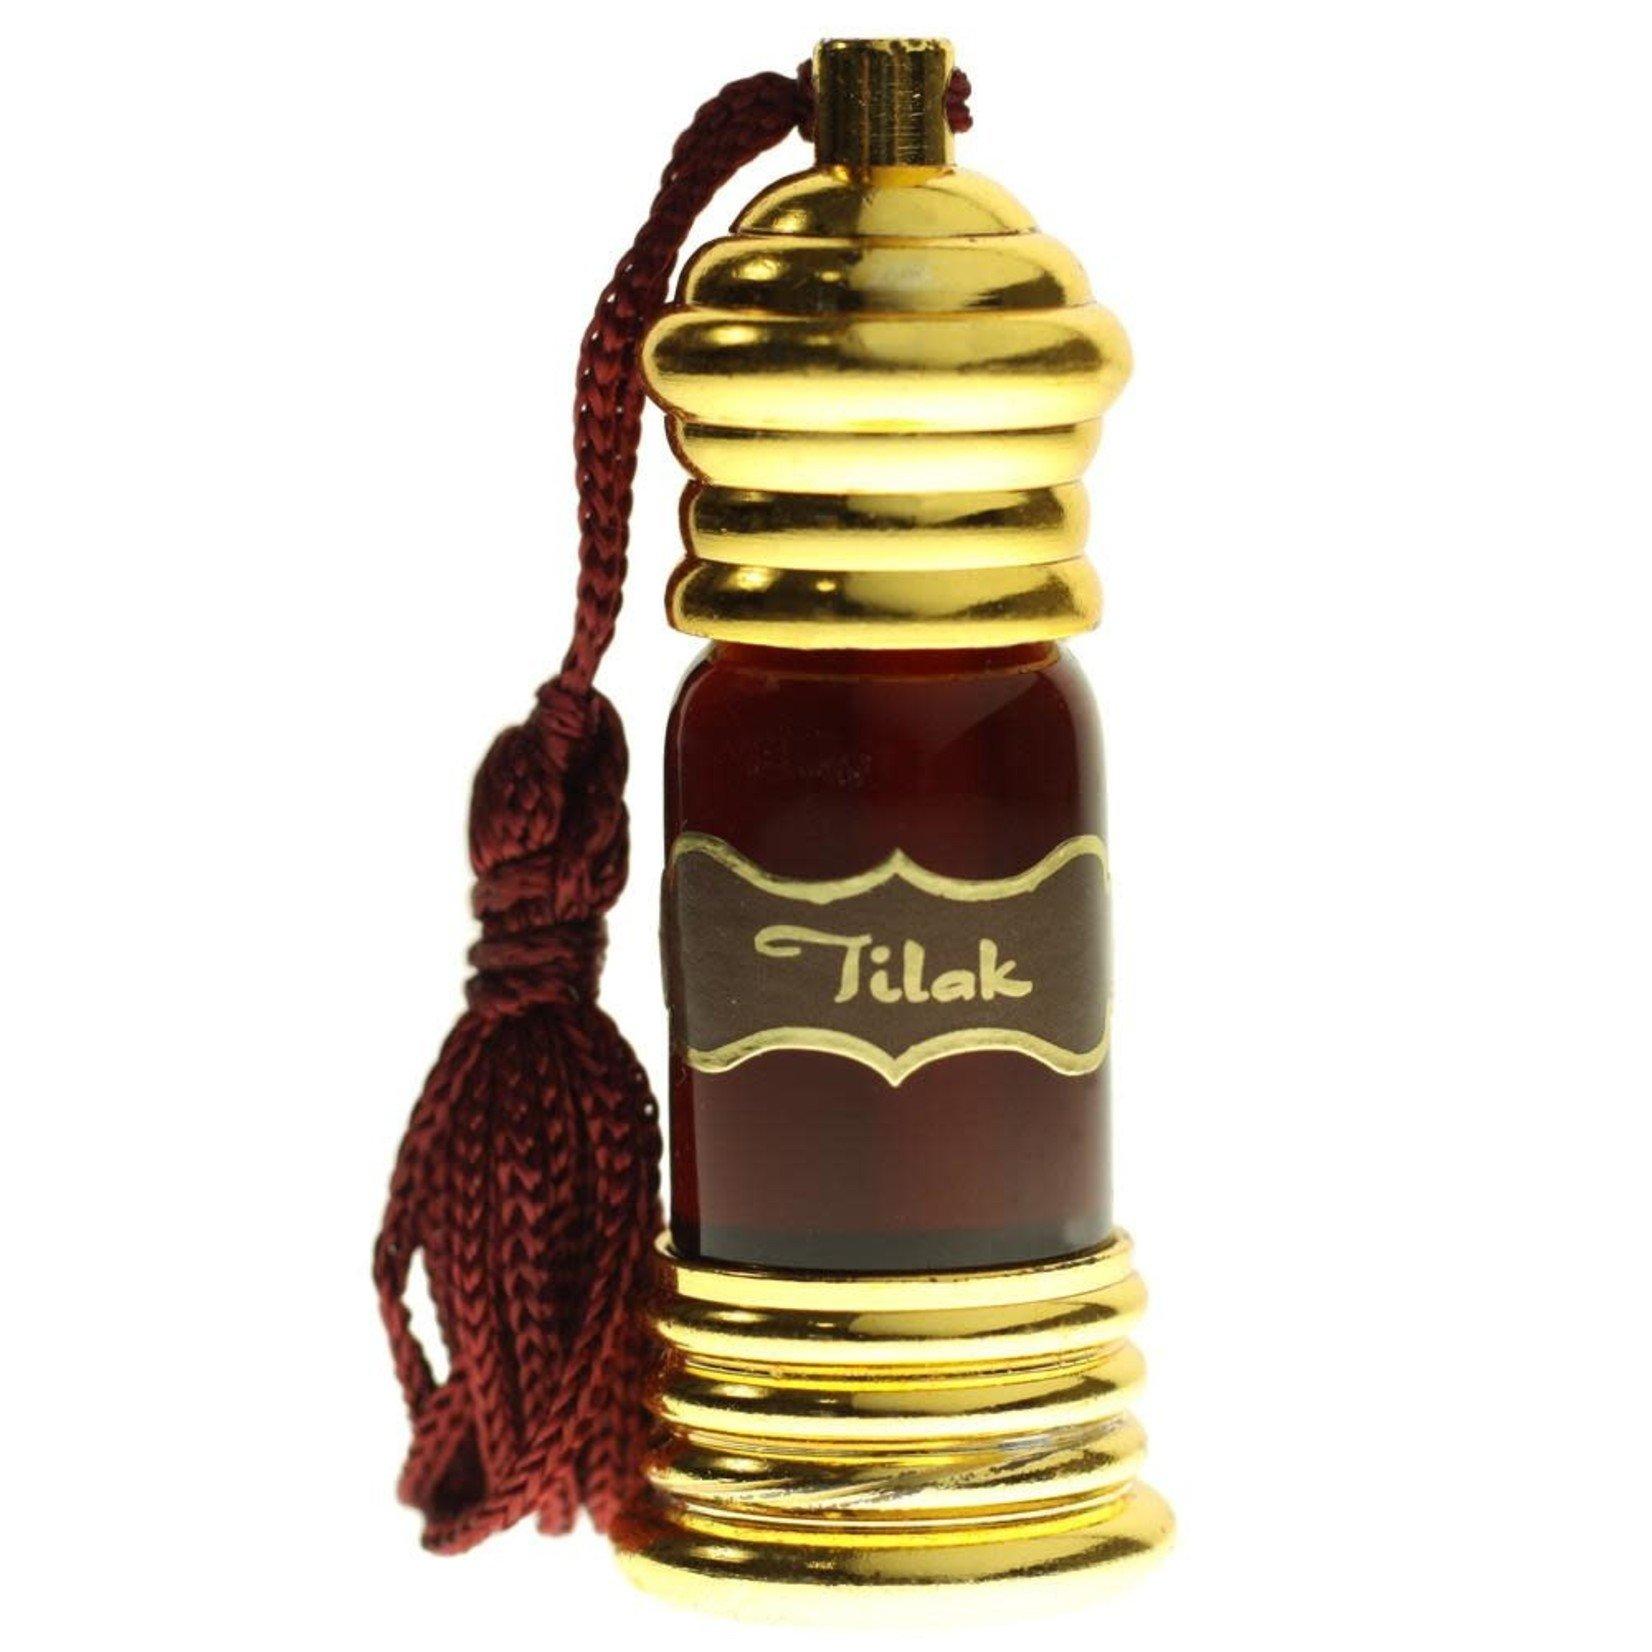 Prabhujis Gifts Perfume Attar Oil Tilak - Love